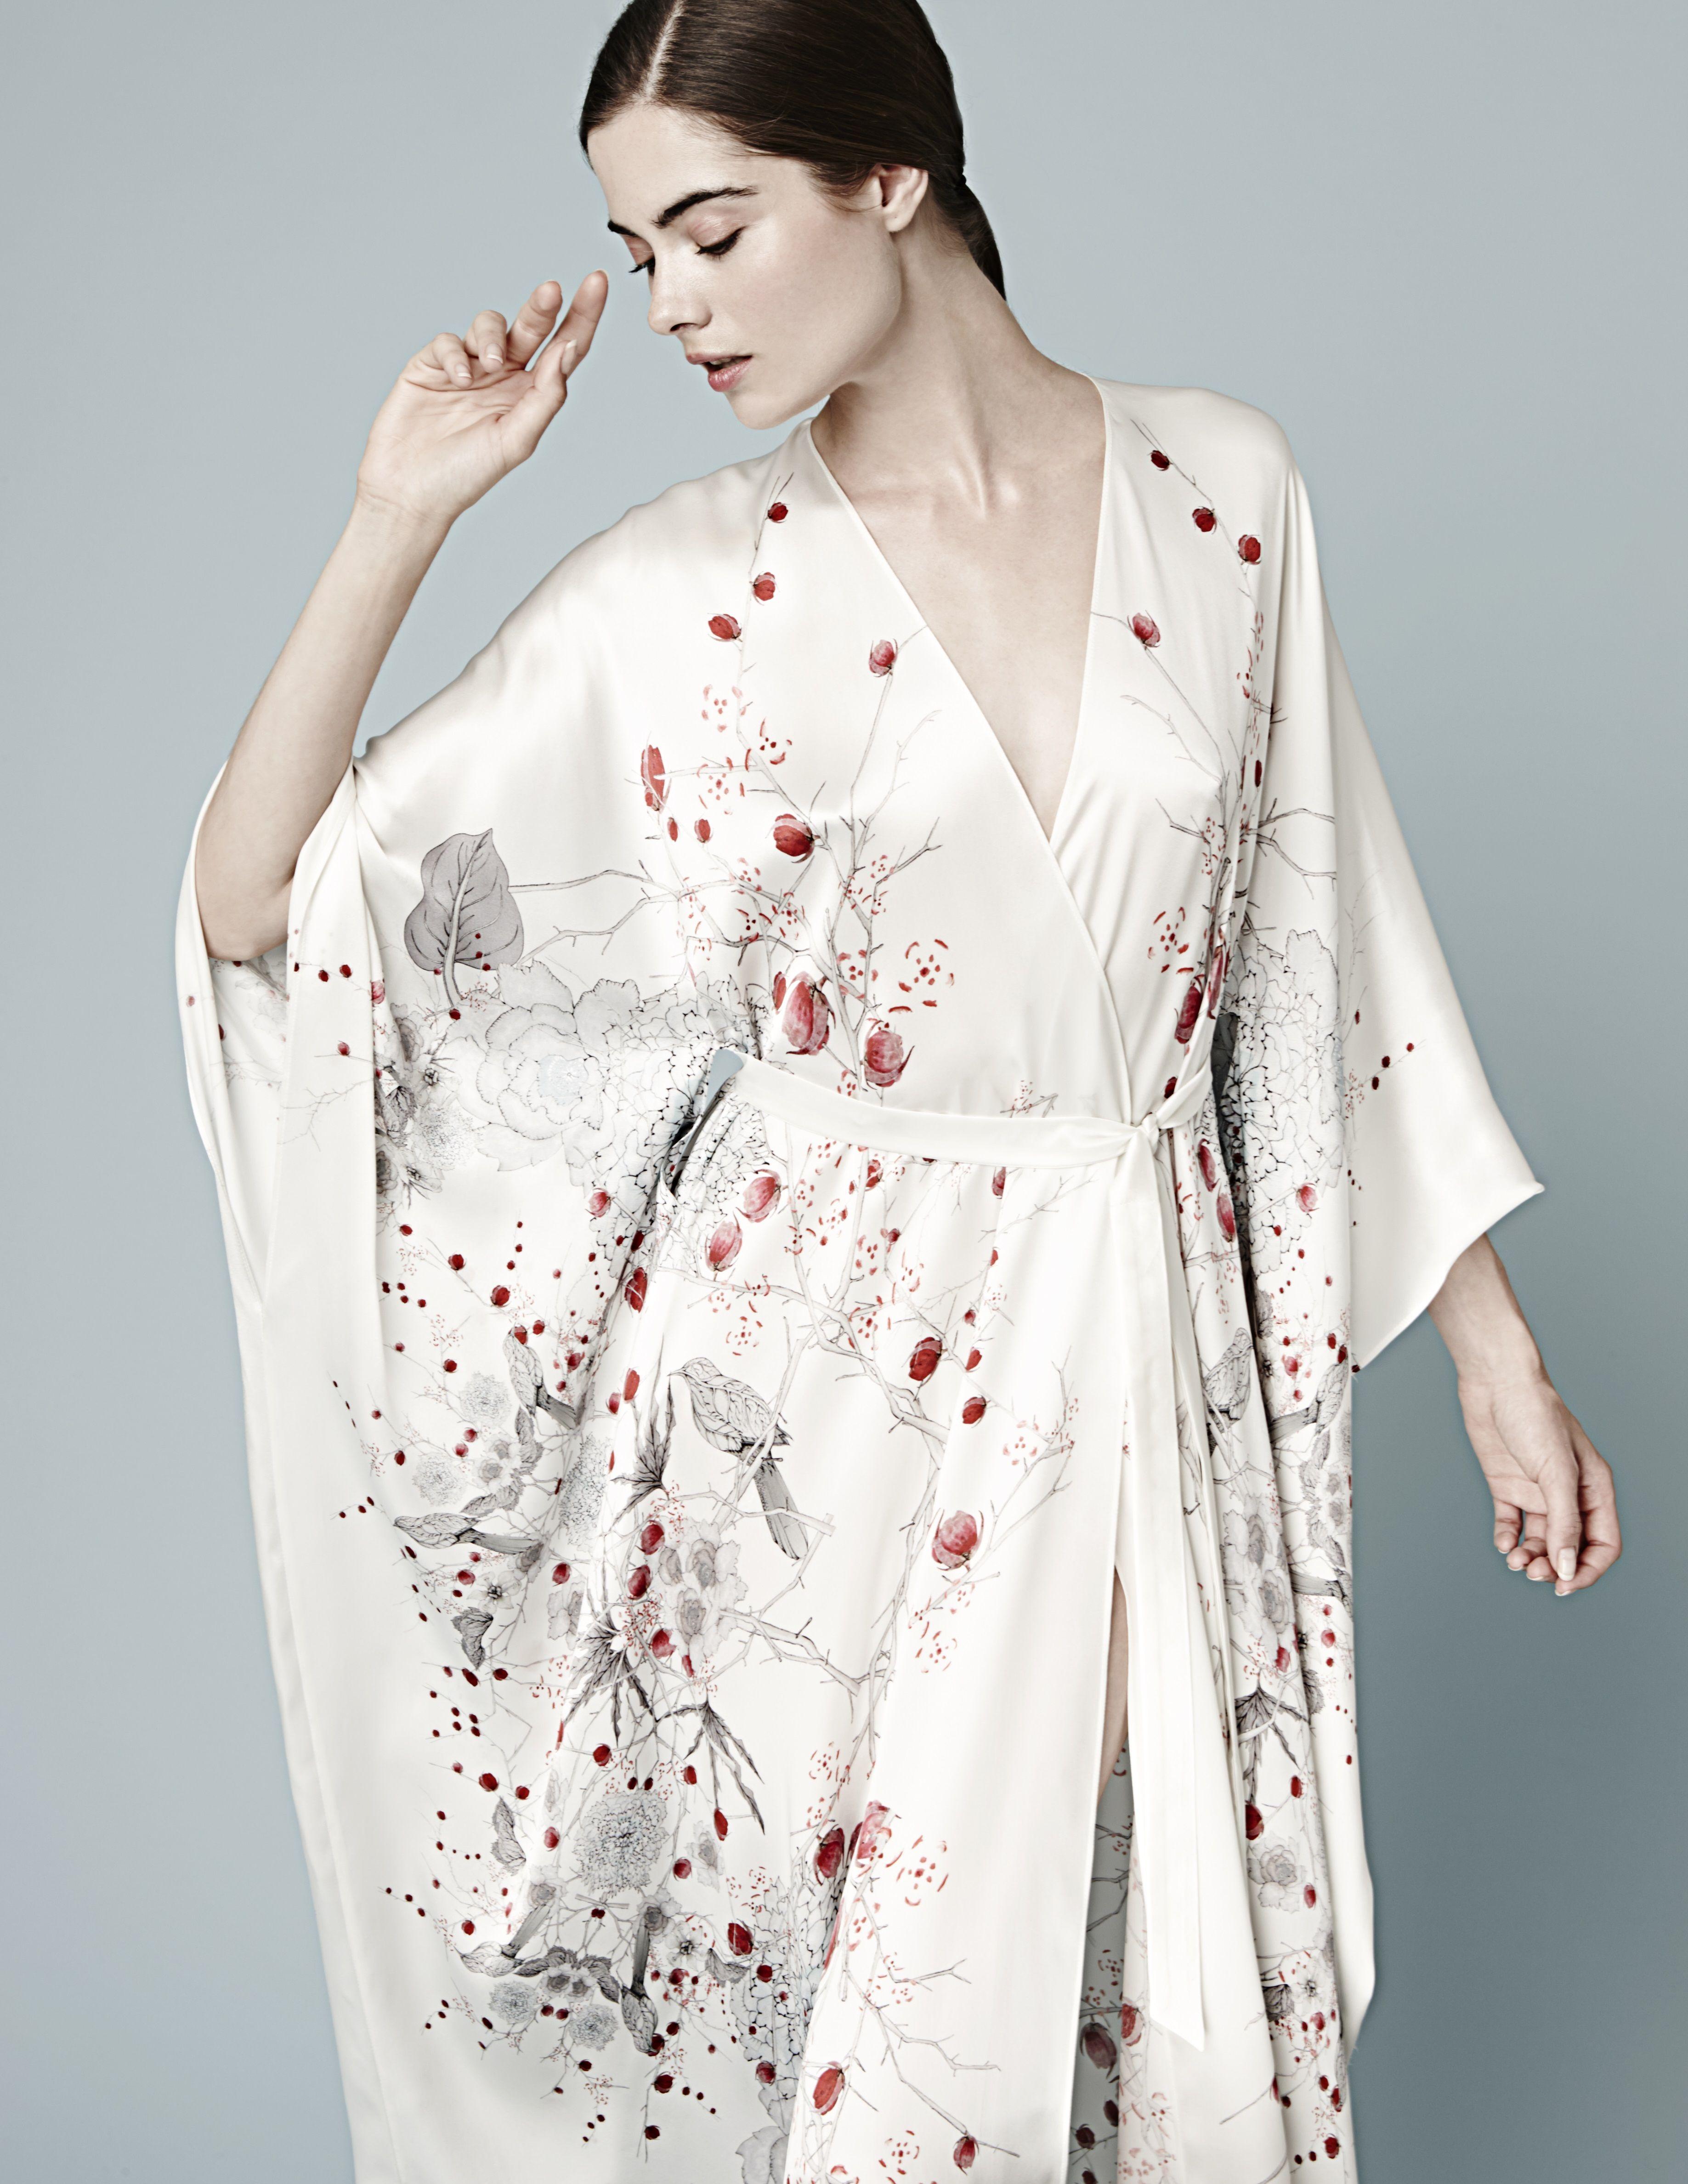 71c59856e7 Meng AW14 luxury loungewear - Cherry Blossom print - silk satin v neck wrap  - white